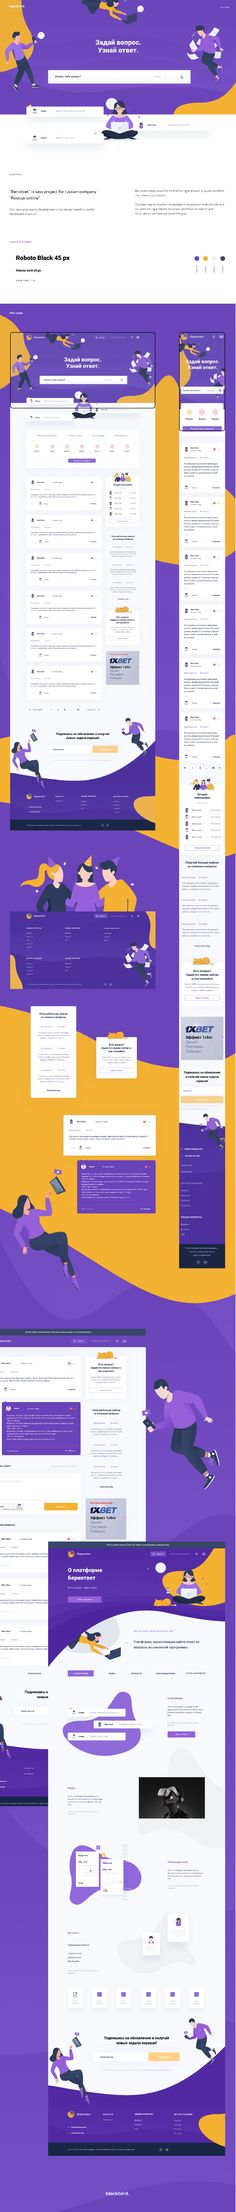 Beriotvet - SASS platform & corporate website on Behance Corporate Website, Web Design, Photoshop, Platform, Adobe, Behance, Design Web, Cob Loaf, Heel